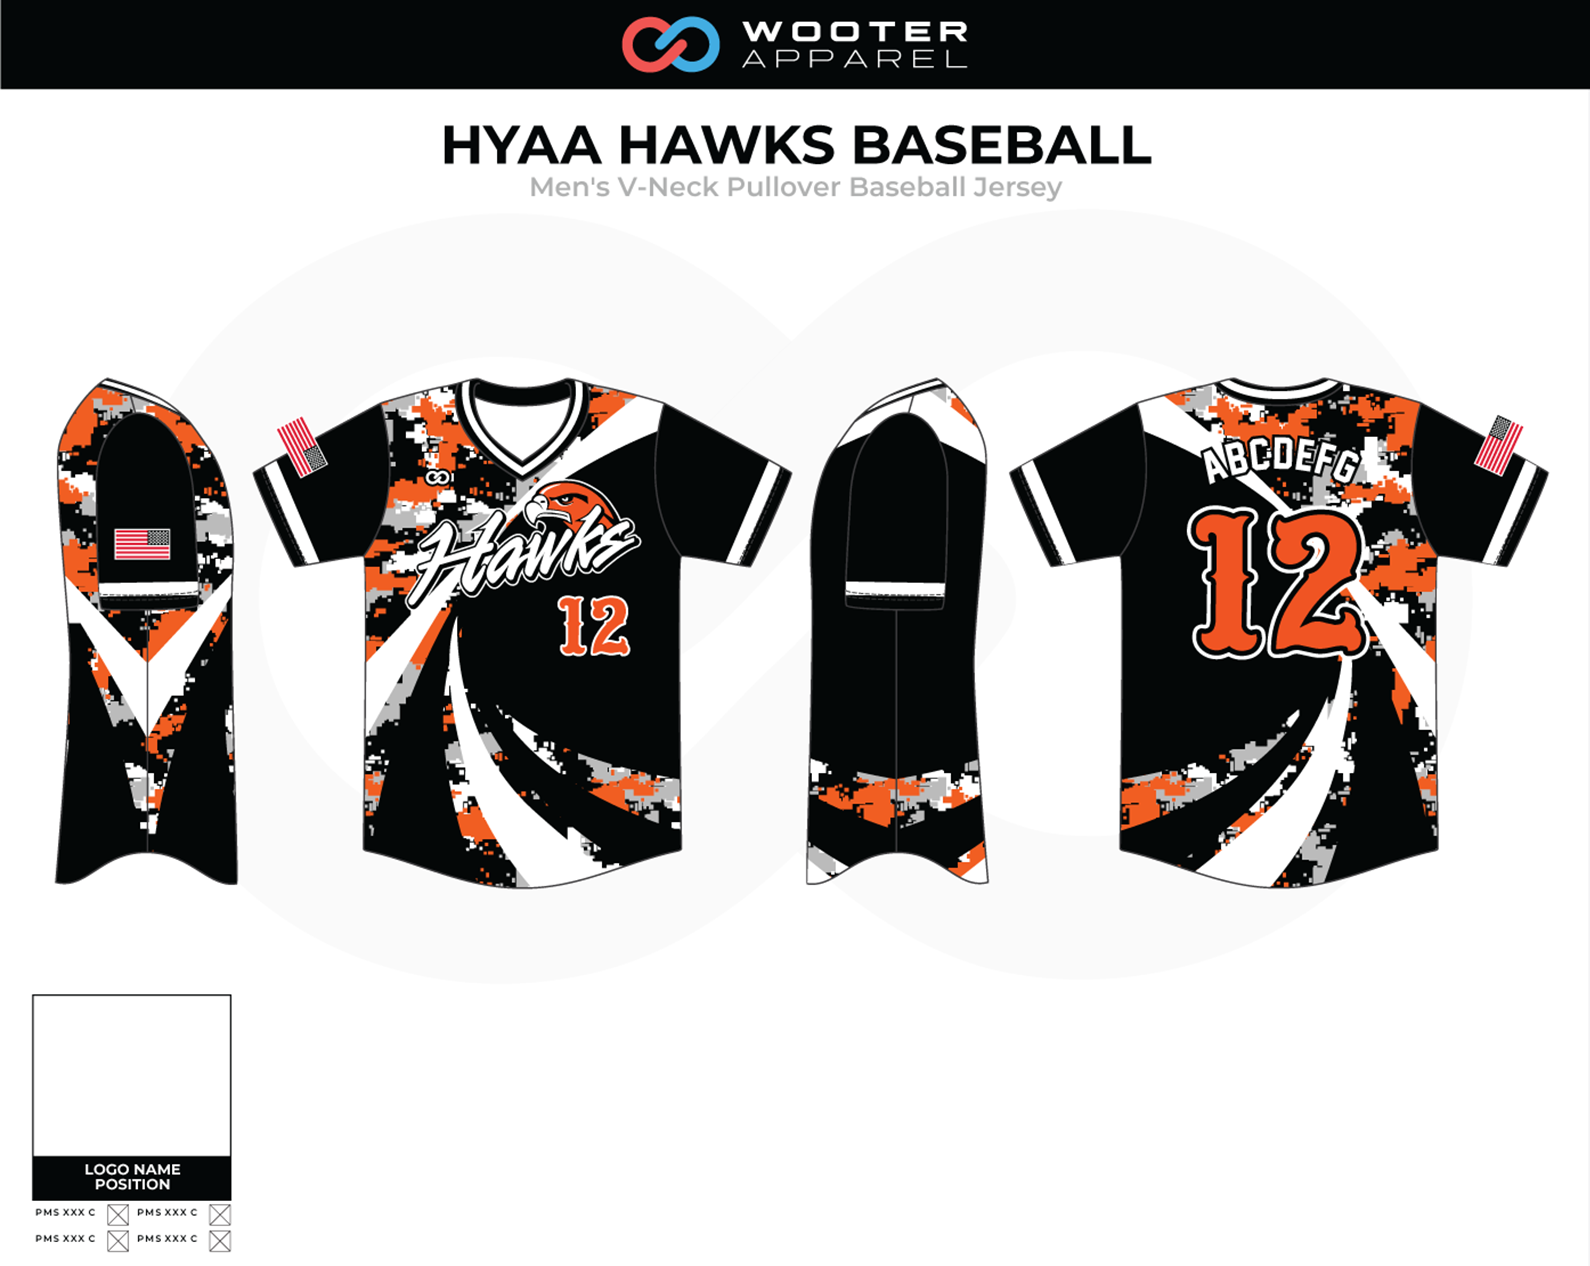 HYAAHawksBaseball_JerseyMockupV2.png